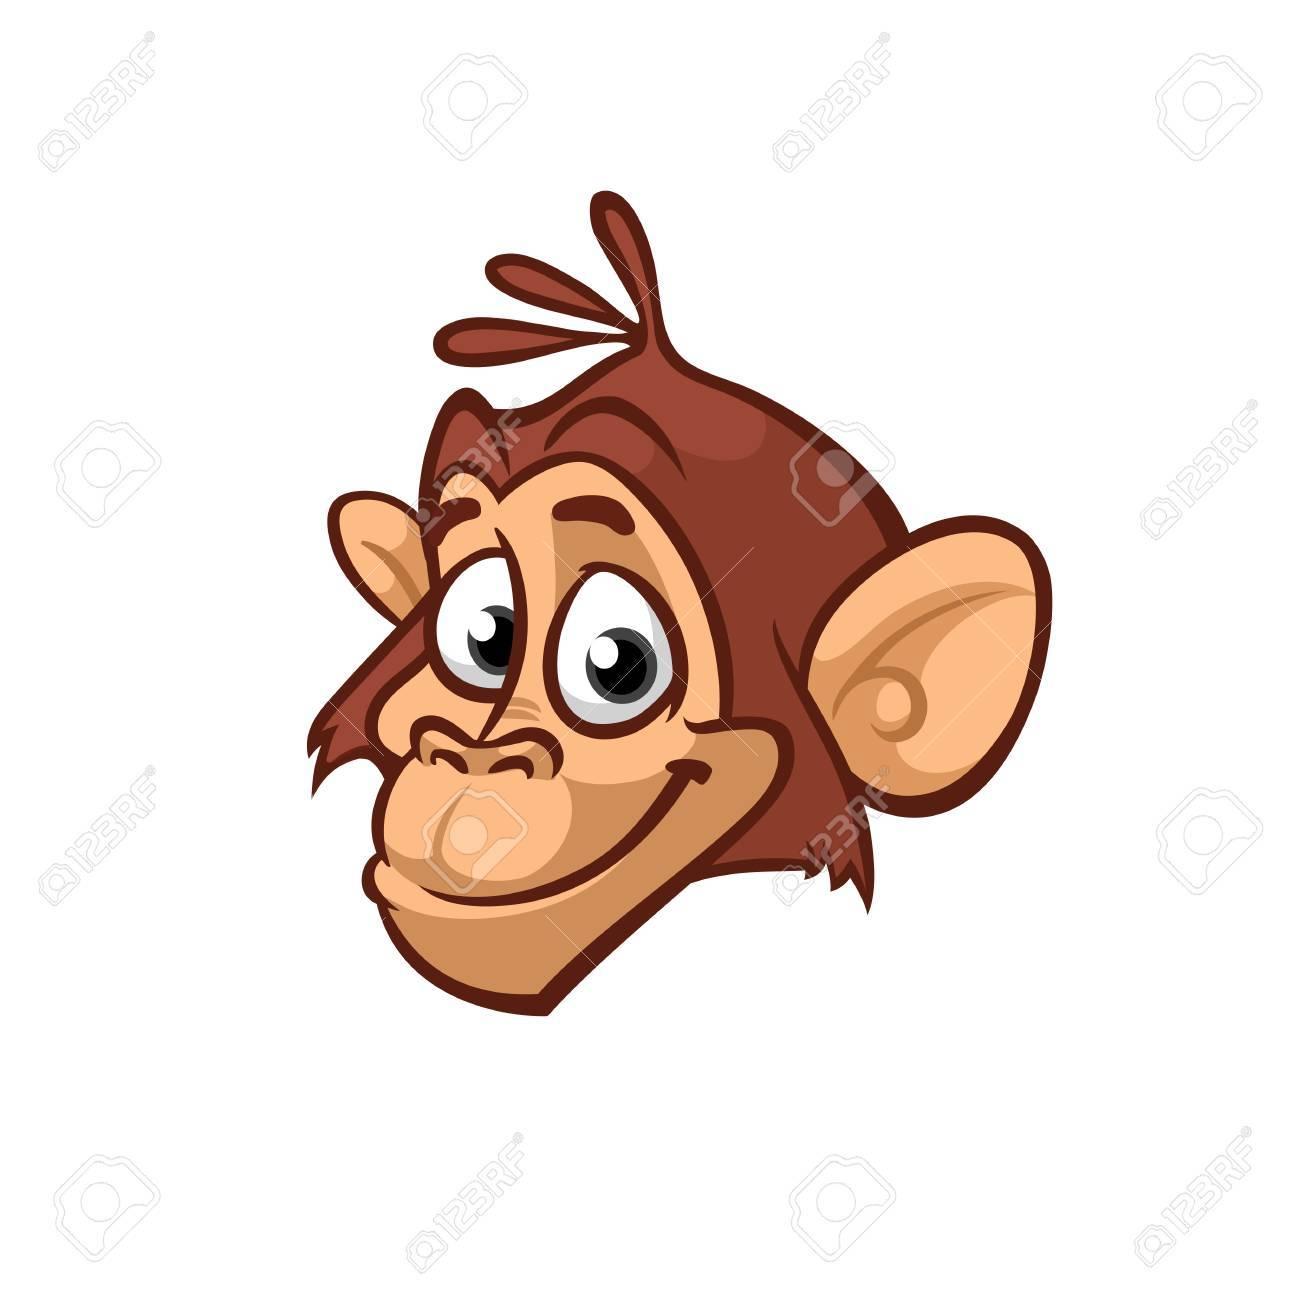 cartoon monkey head icon vector isolated royalty free cliparts rh 123rf com cartoon monkey head drawing cartoon monkey scratching head